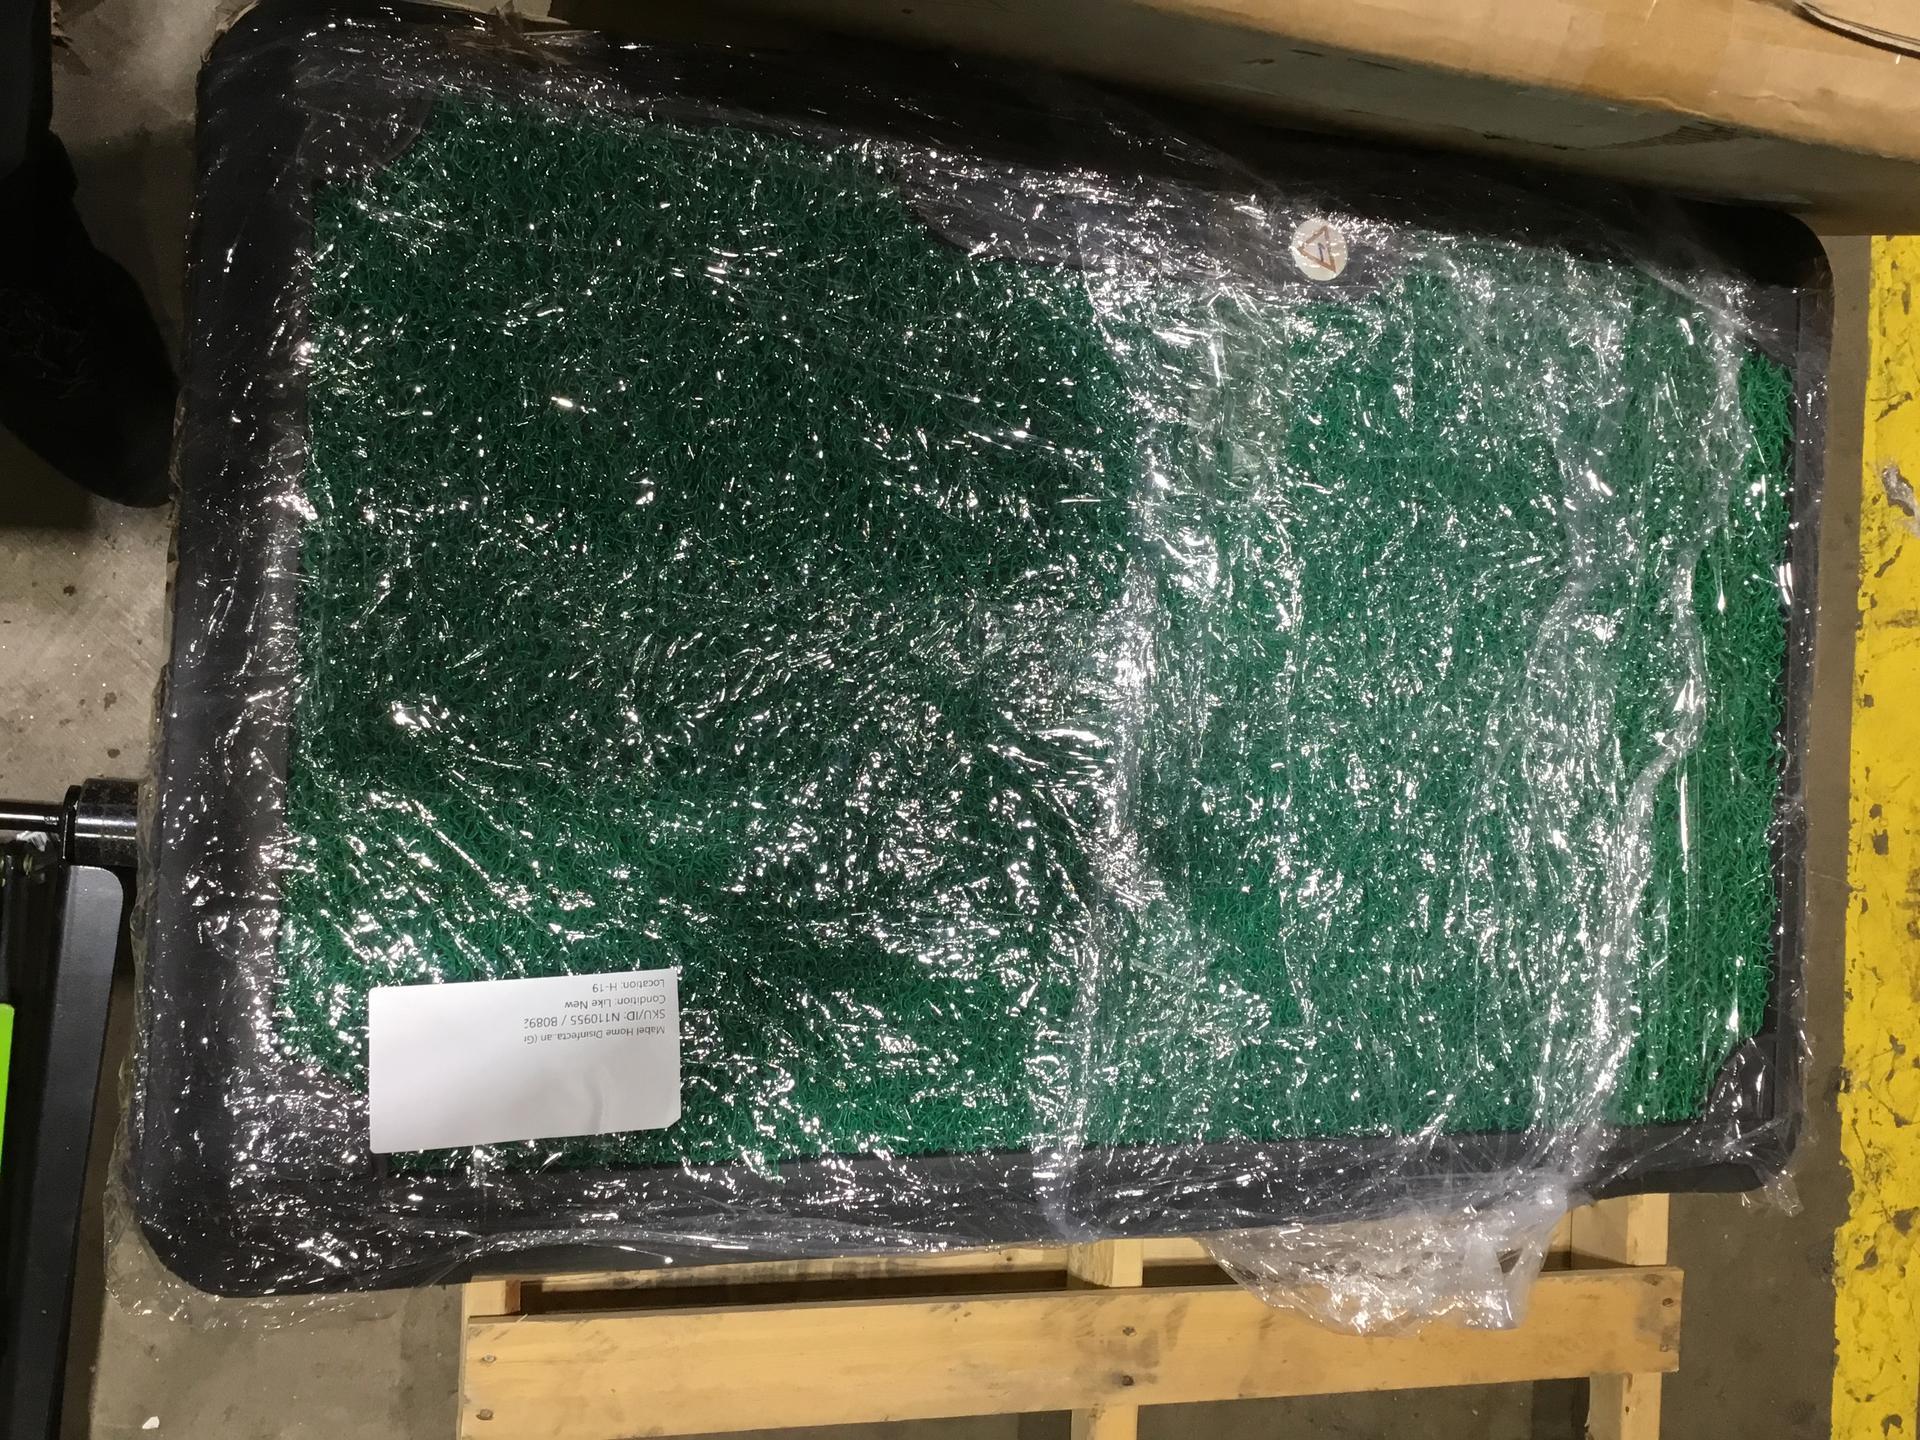 Mabel Home Disinfectant PVC Doormat, 18x28 , Corona Doormat, Outdoor-Indoor, Disinfectant Pool, Easy 2 Clean (Green)*Pack of 3*